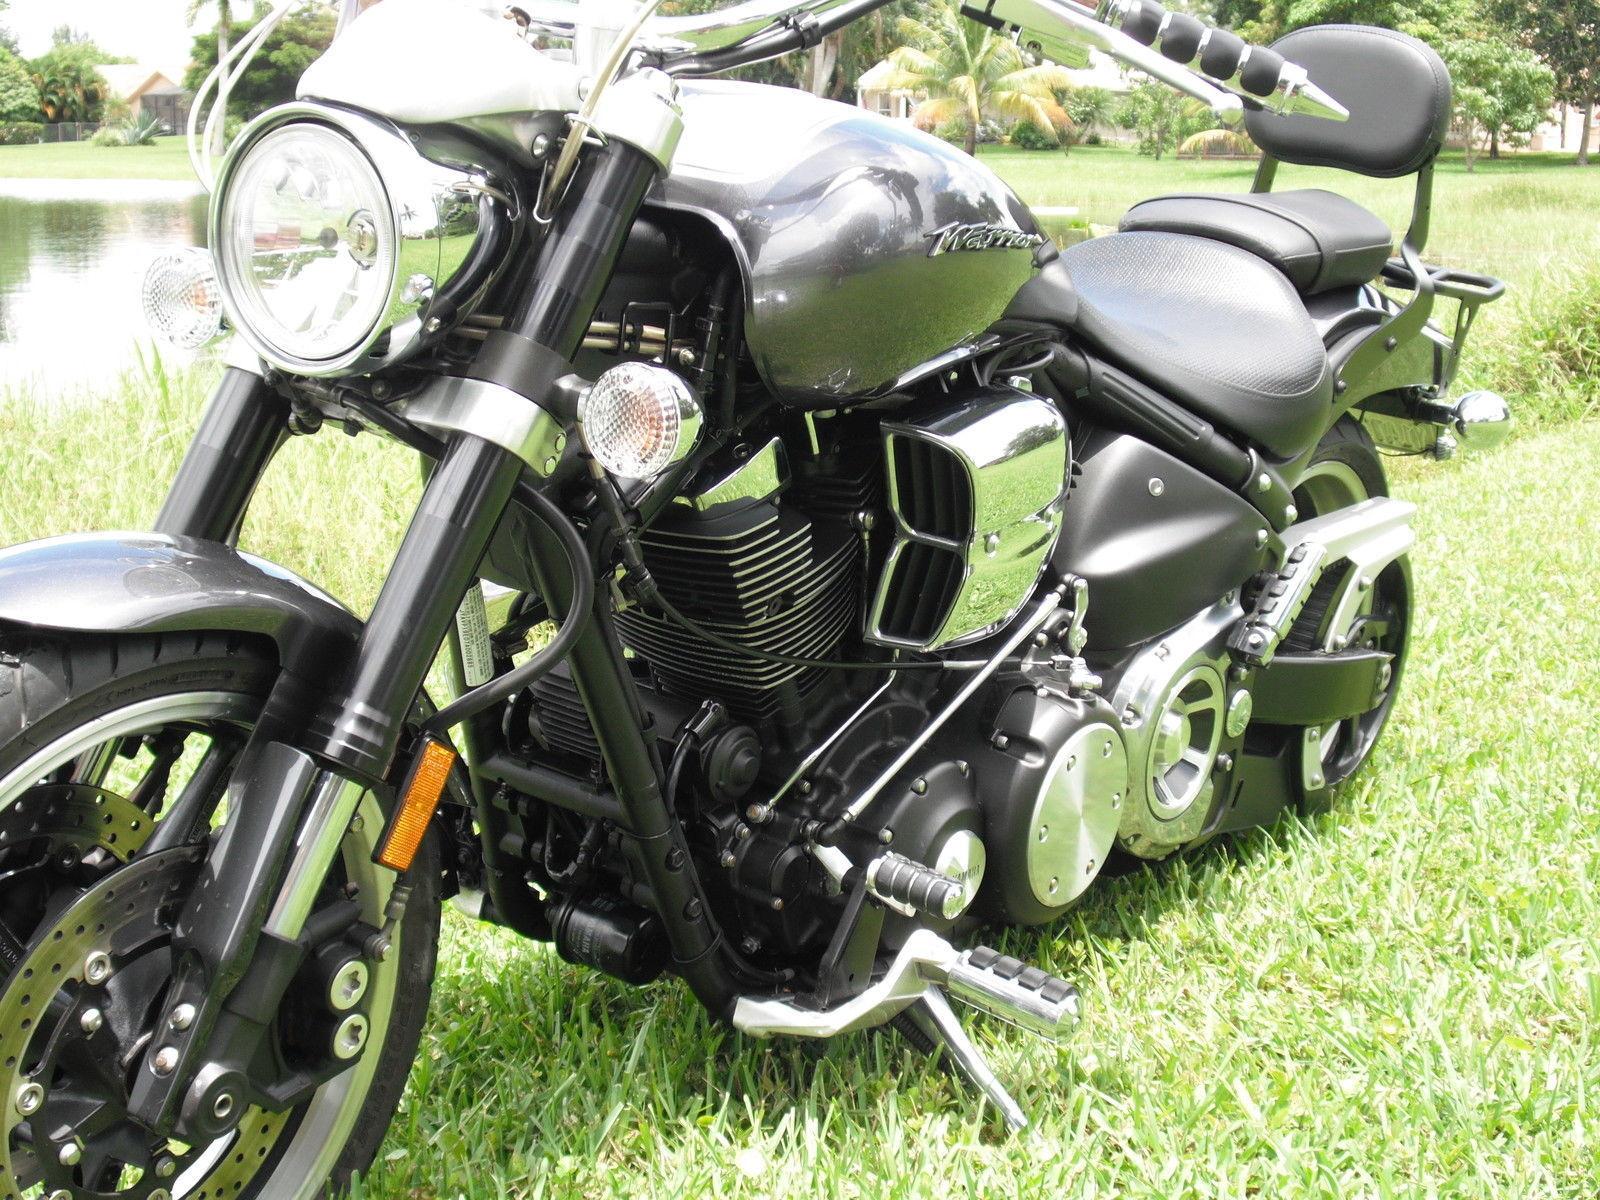 2007 Yamaha Xv1700 Roadstar Warrior 4k Miles 2002 Wiring Harness Road Star